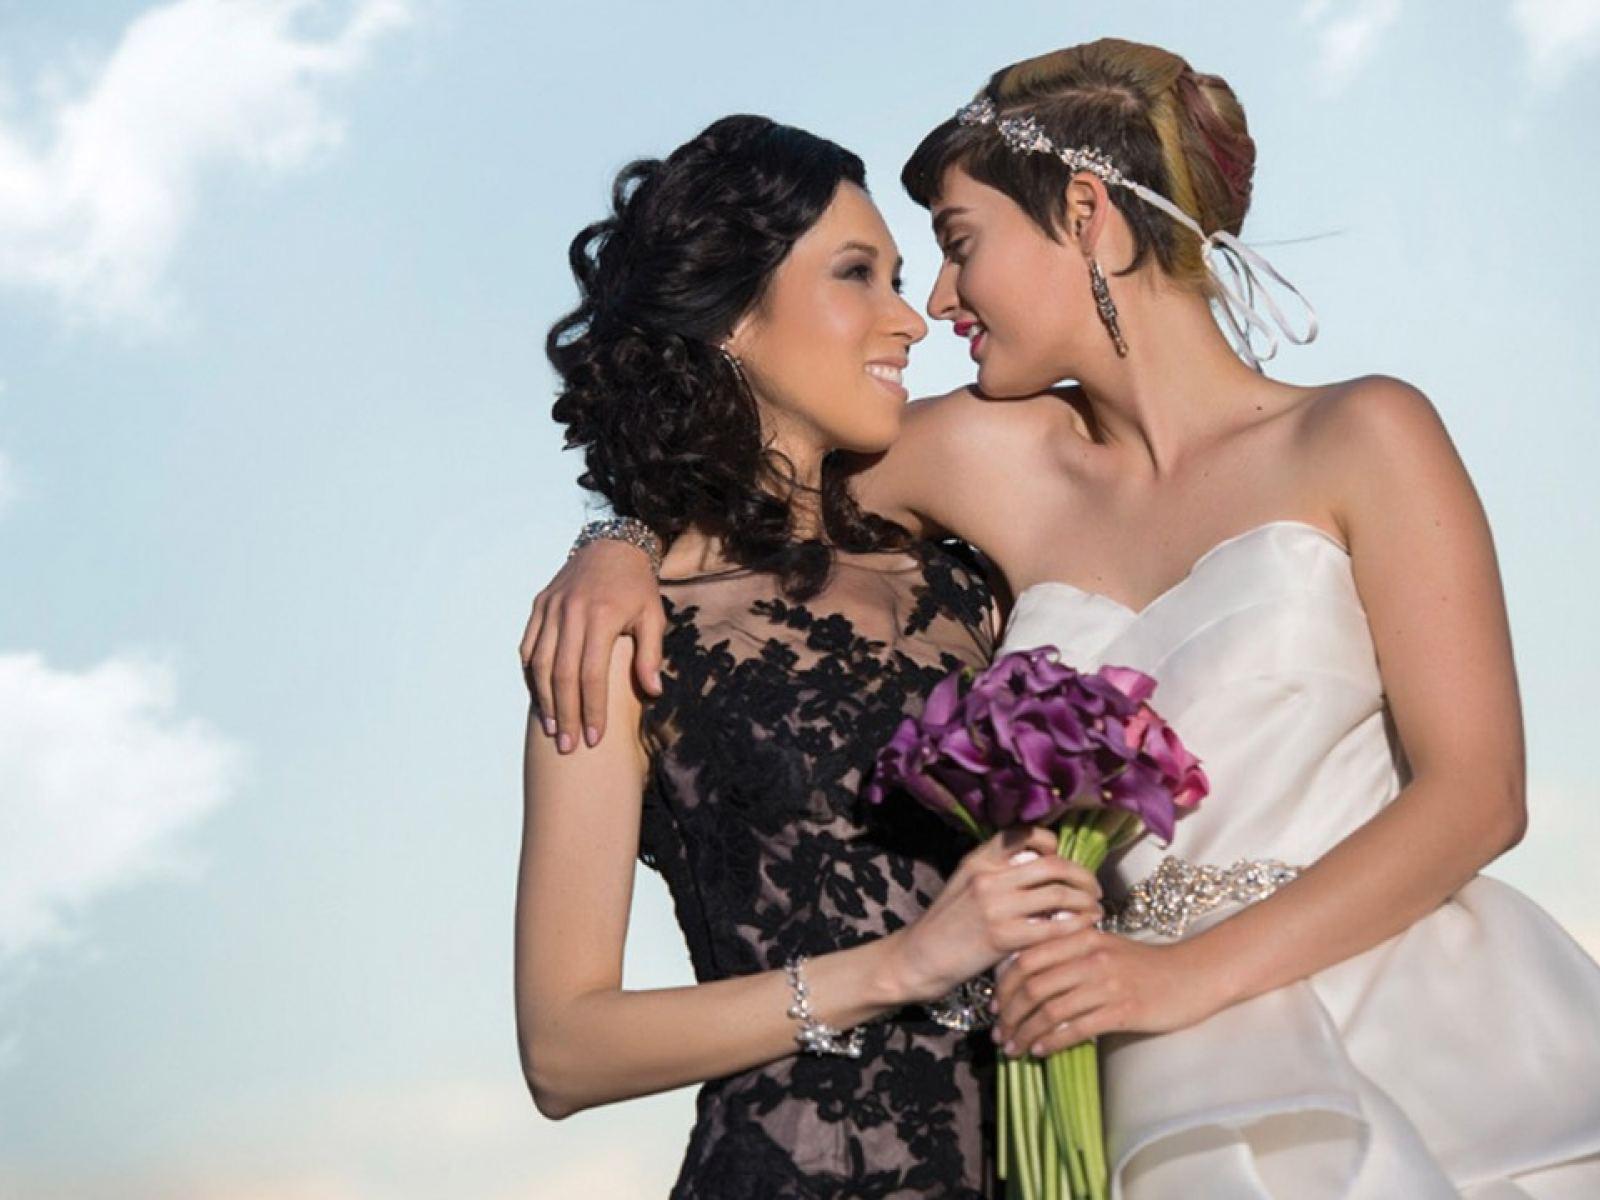 Four Seasons Los Angeles at Beverly Hills LGBTQ wedding